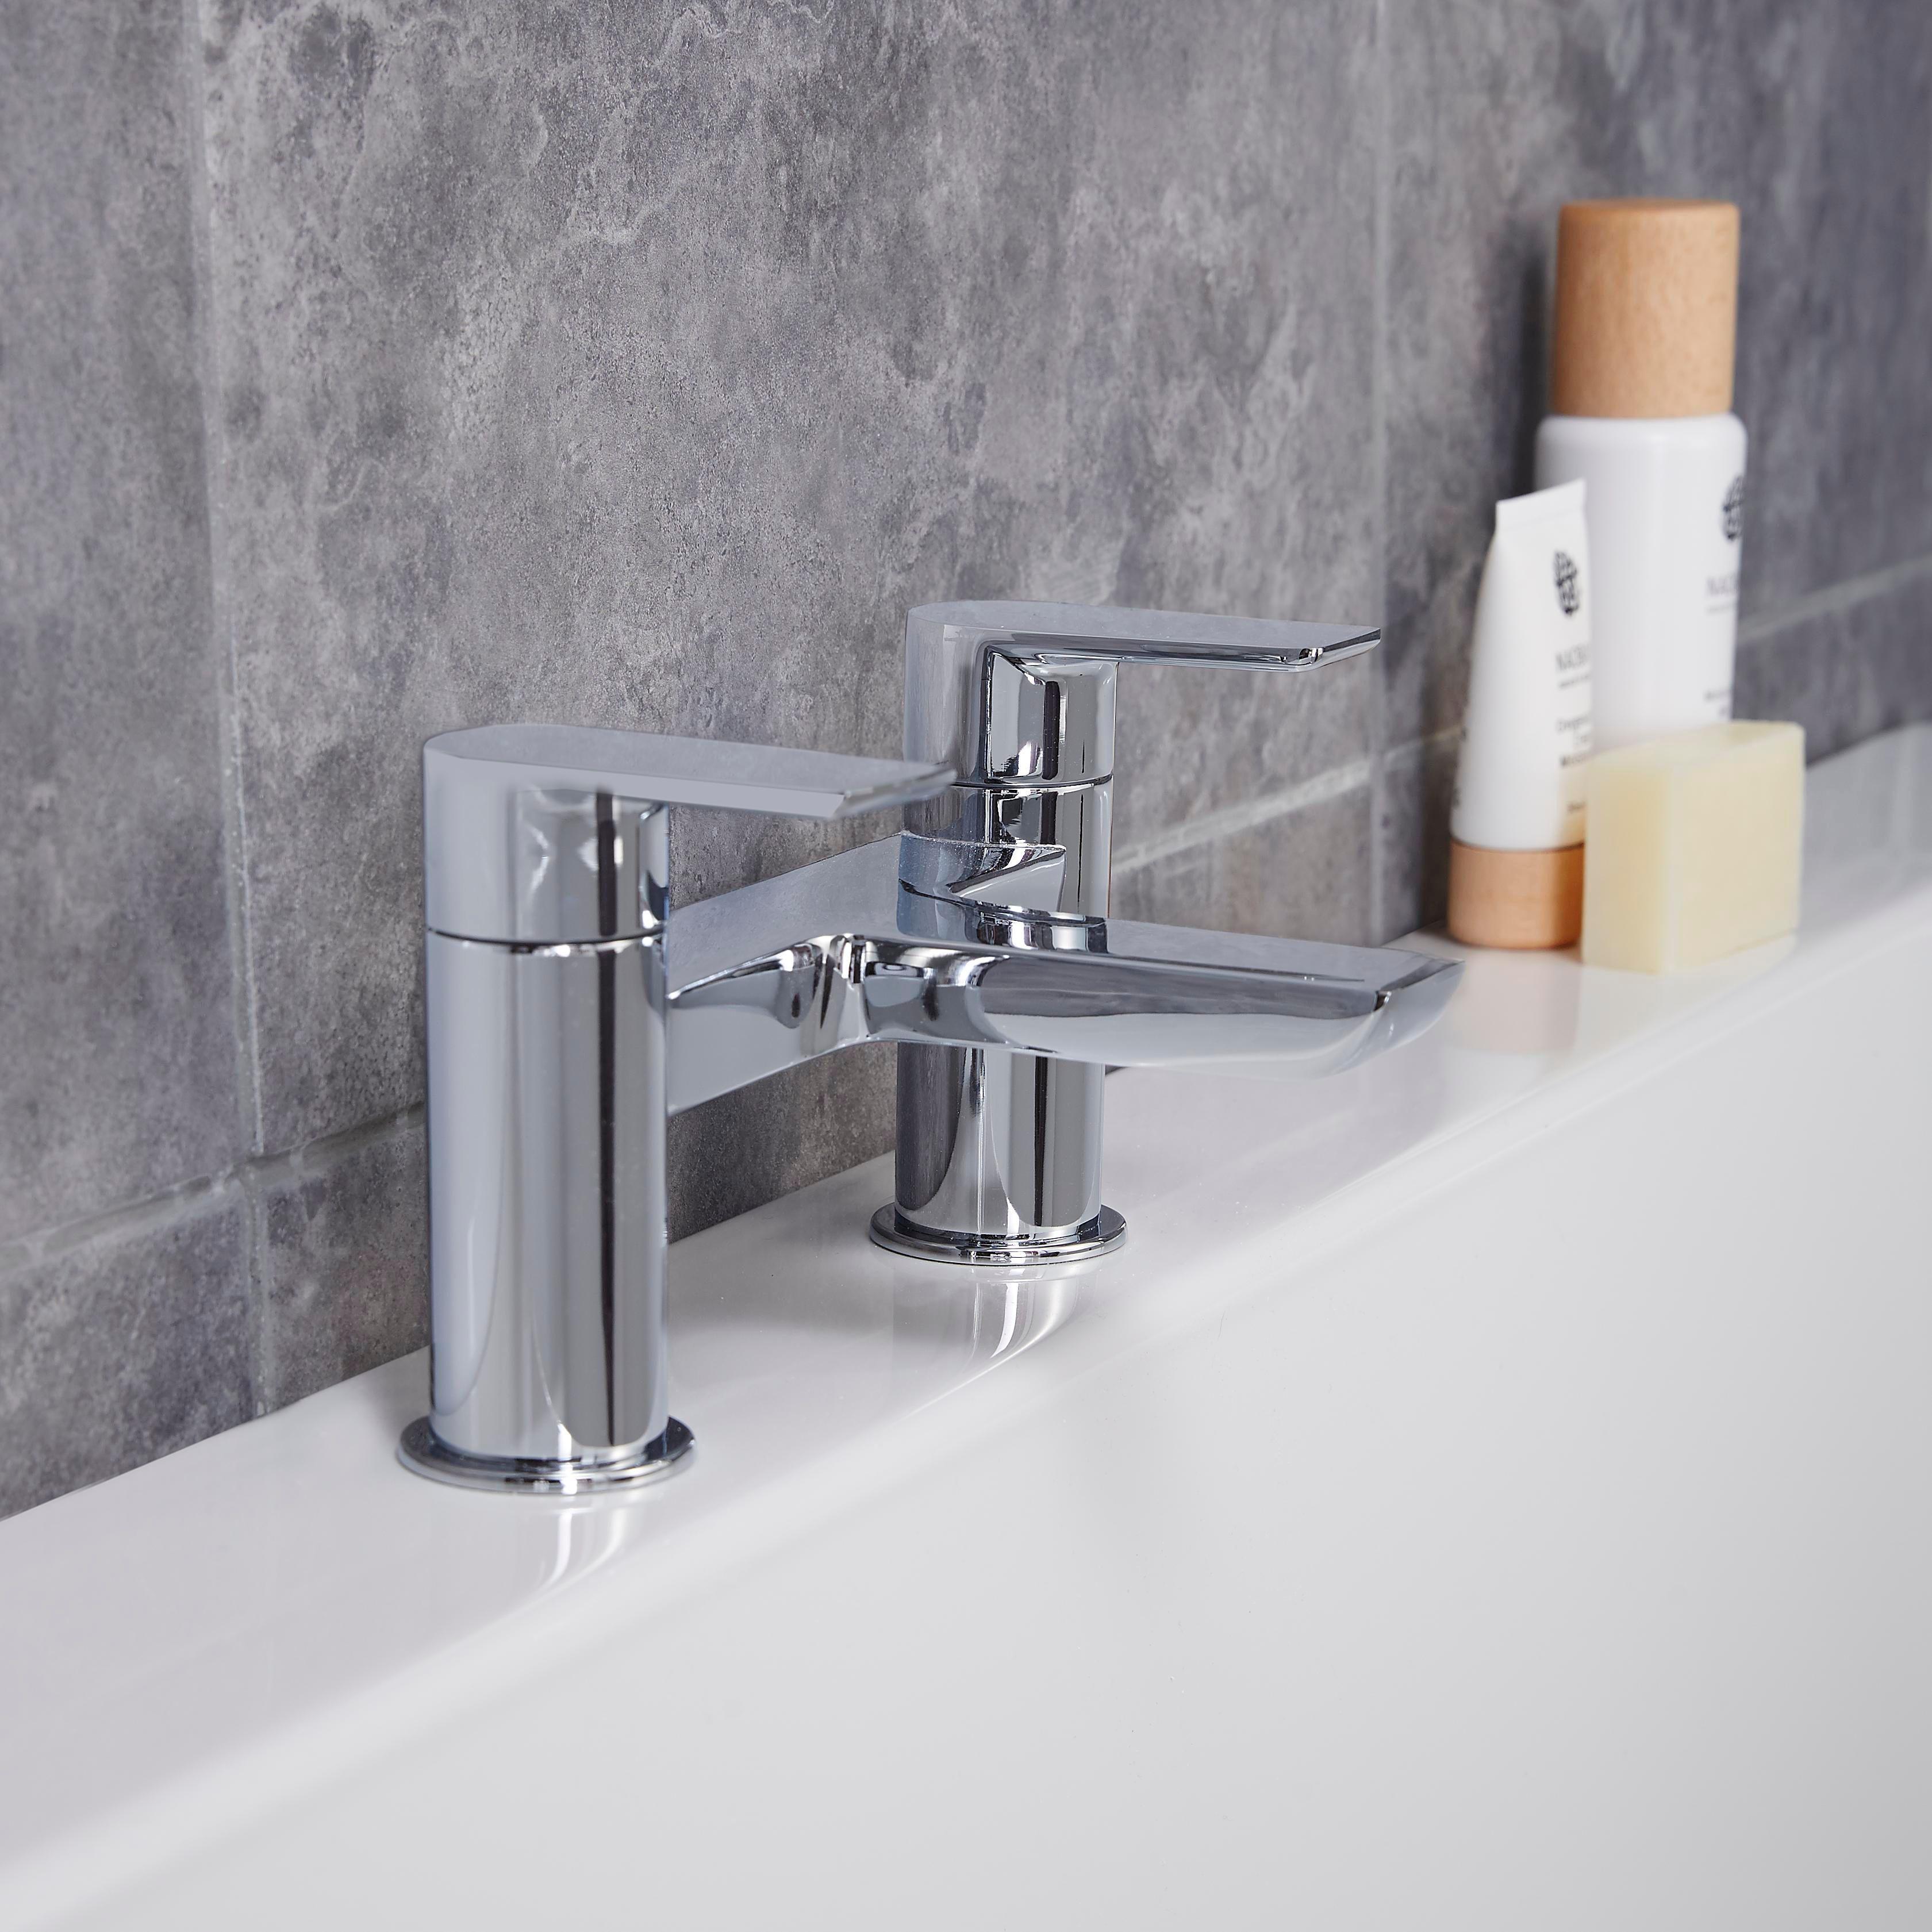 bathroom taps b-q bathroom tap sets VEUPRSU